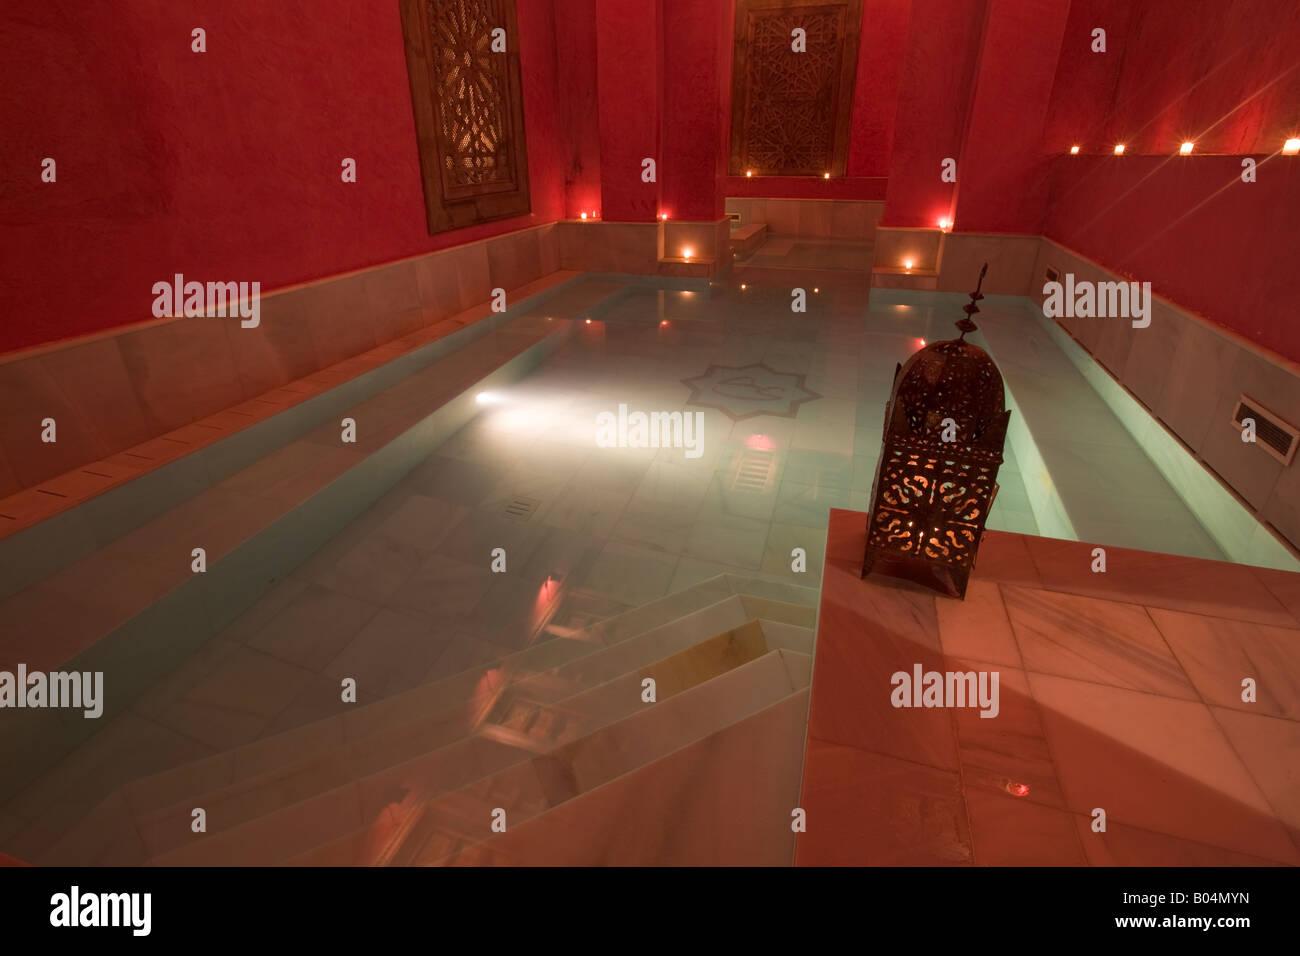 Aire De Sevilla Baños Arabes | One Of Three Baths At Aire De Sevilla Banos Arabes Arab Baths